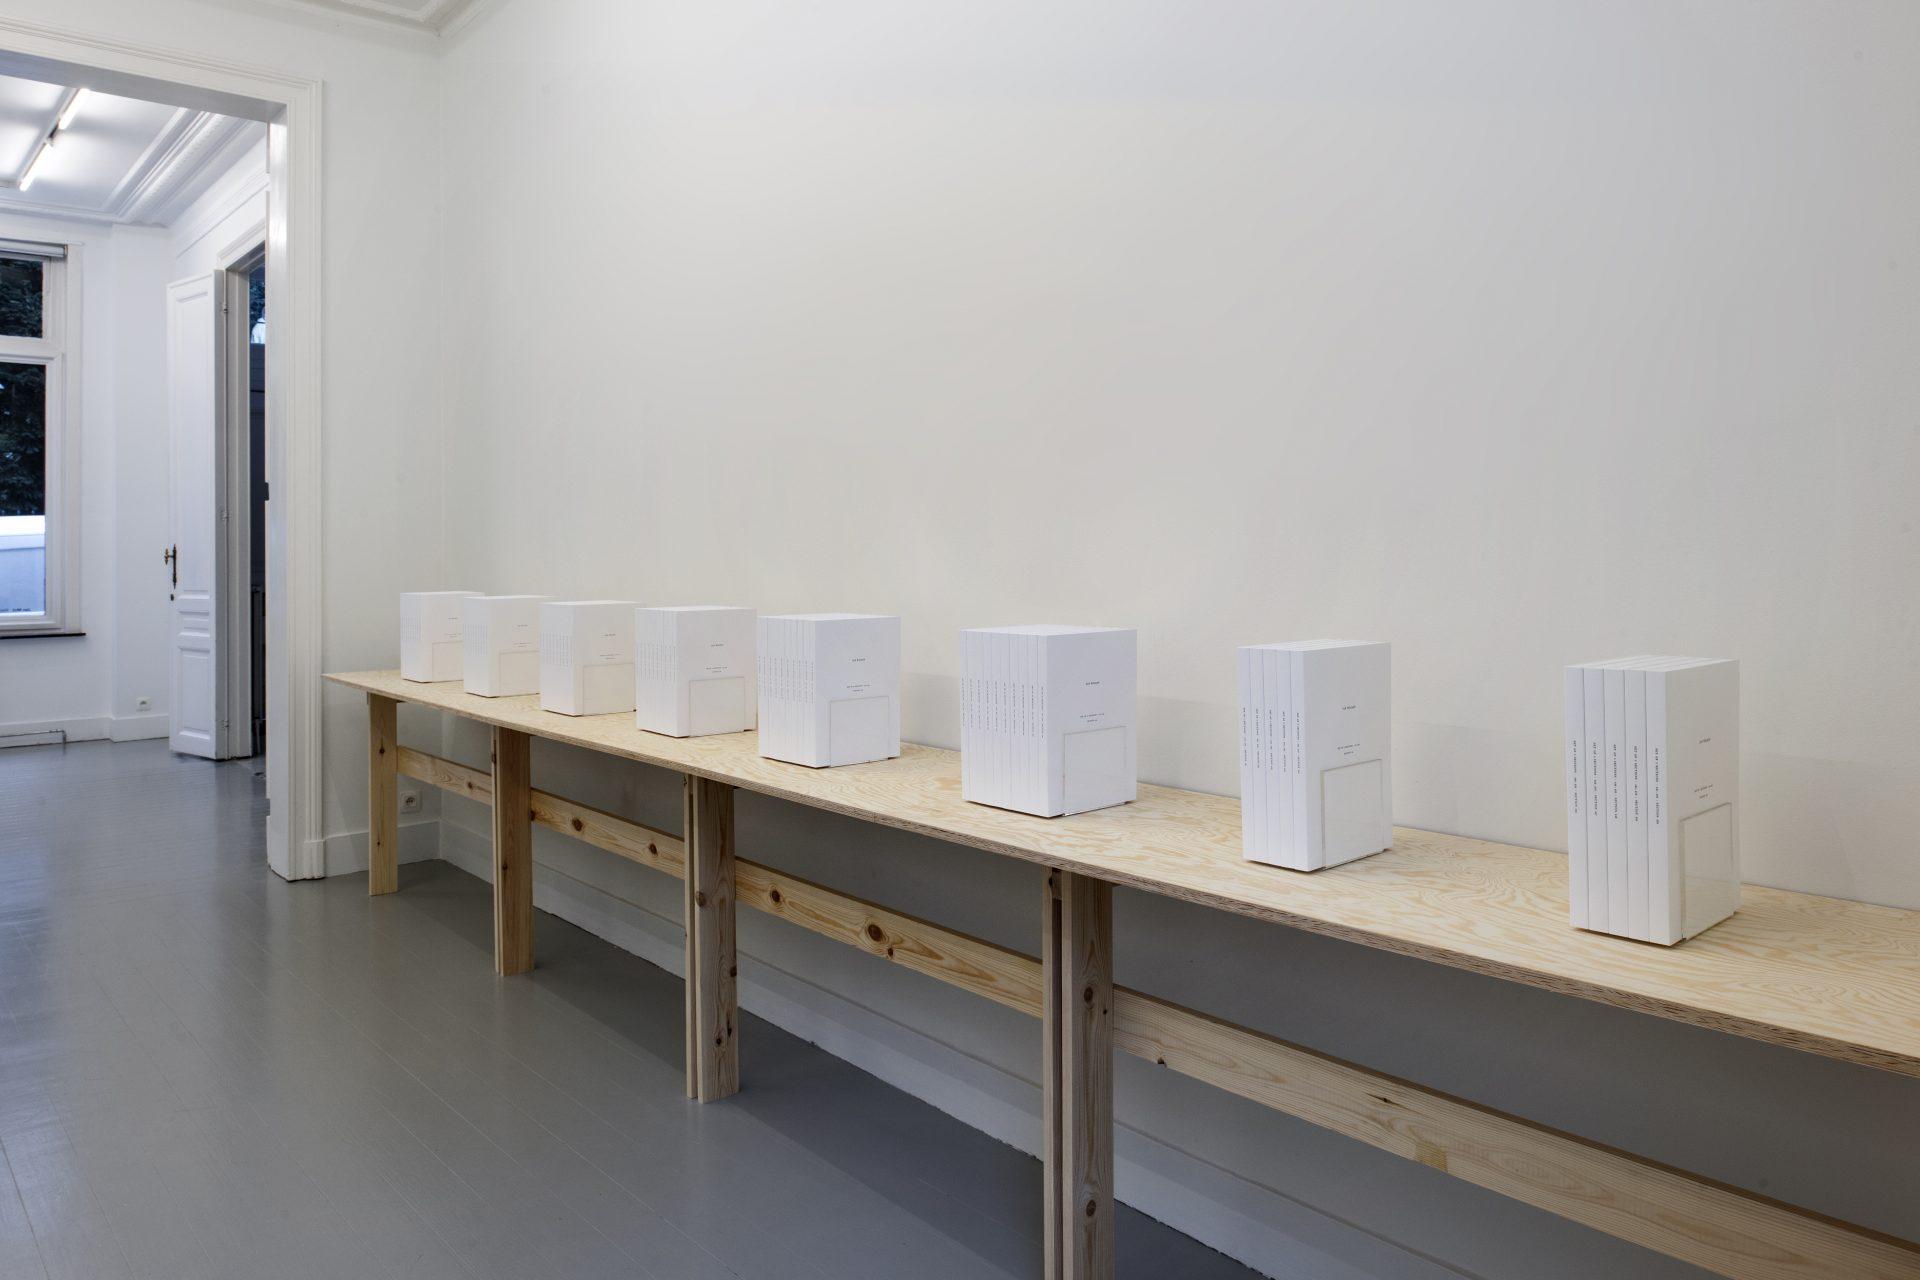 Ian Wilson - installation view at Jan Mot, 2020